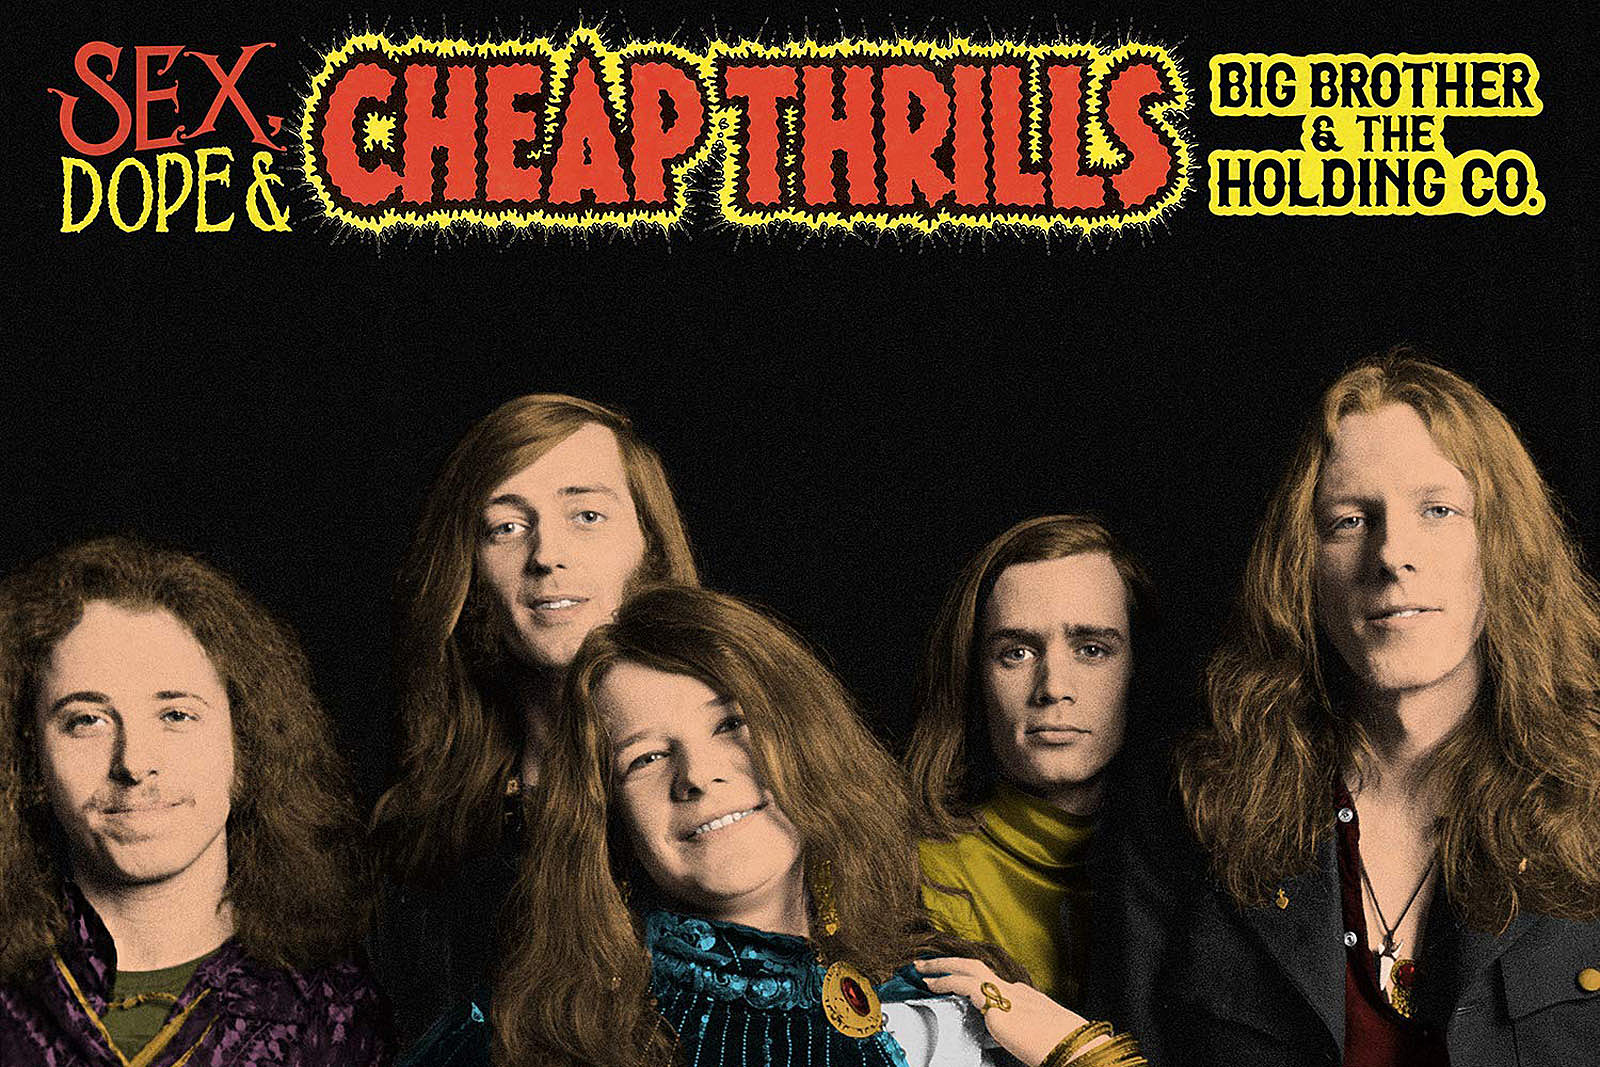 Rare Janis Joplin Tracks Featured on 'Sex, Dope & Cheap Thrills'